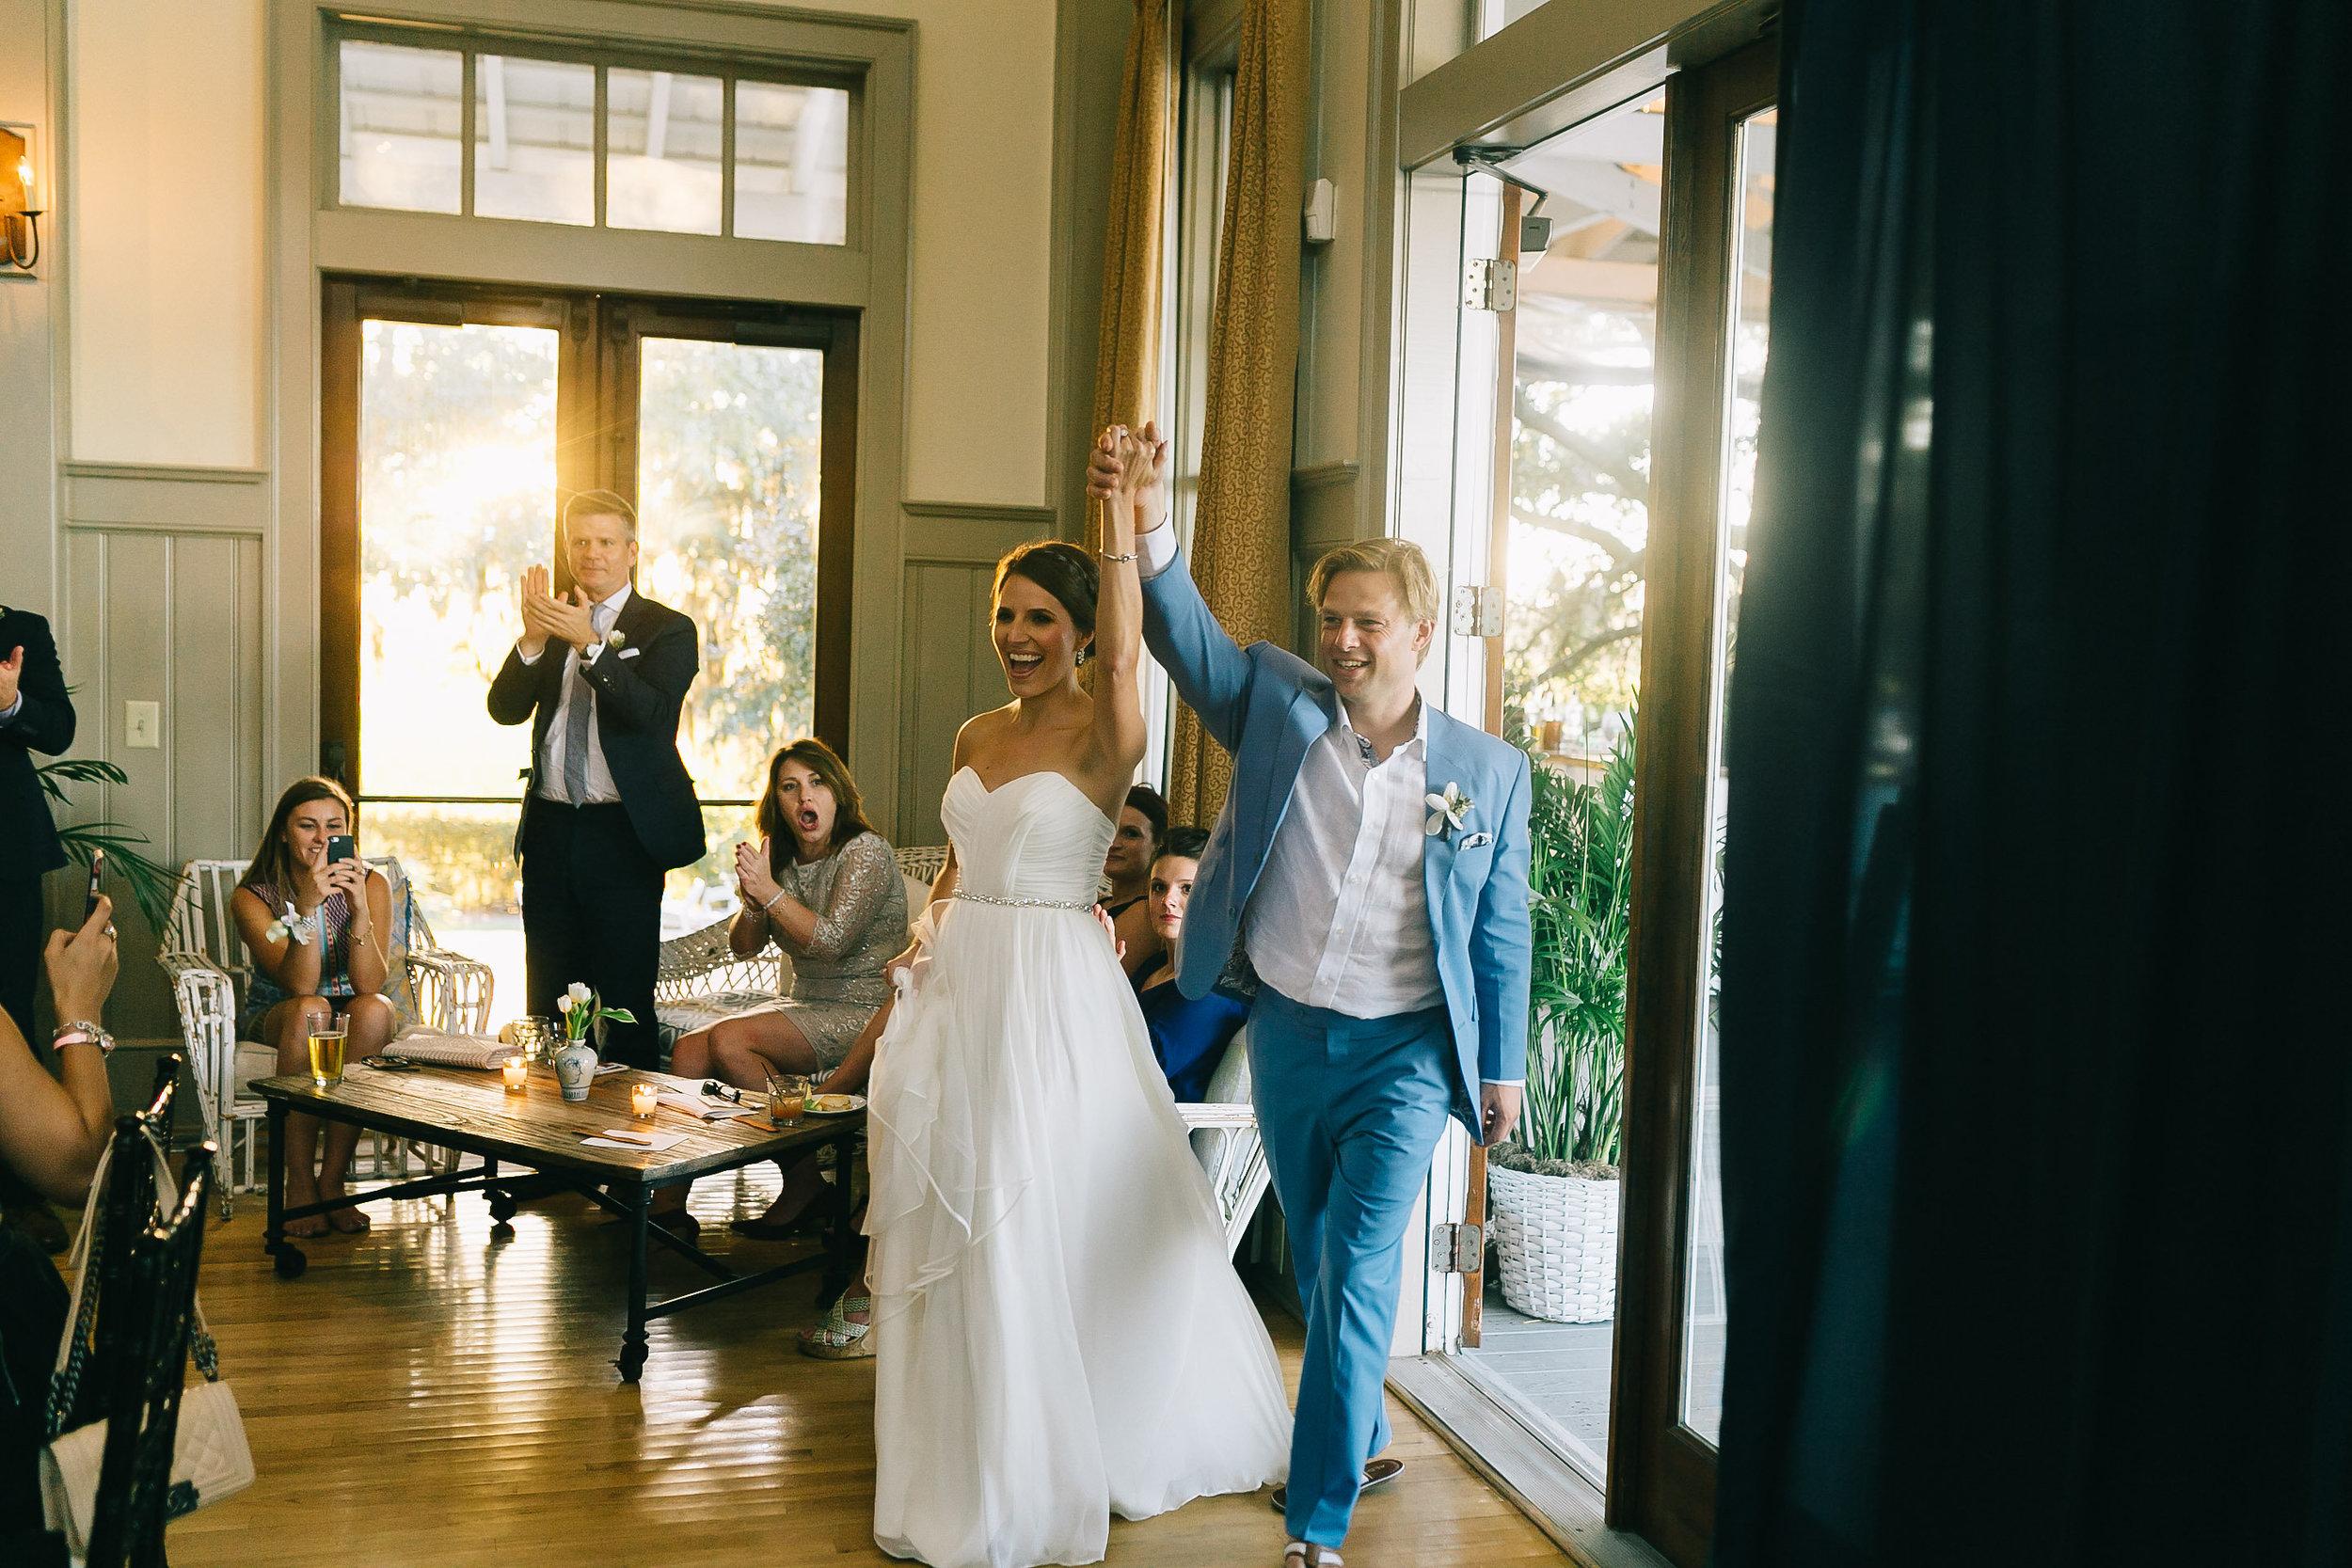 nautical-charleston-wedding-inspiration-0916.jpg